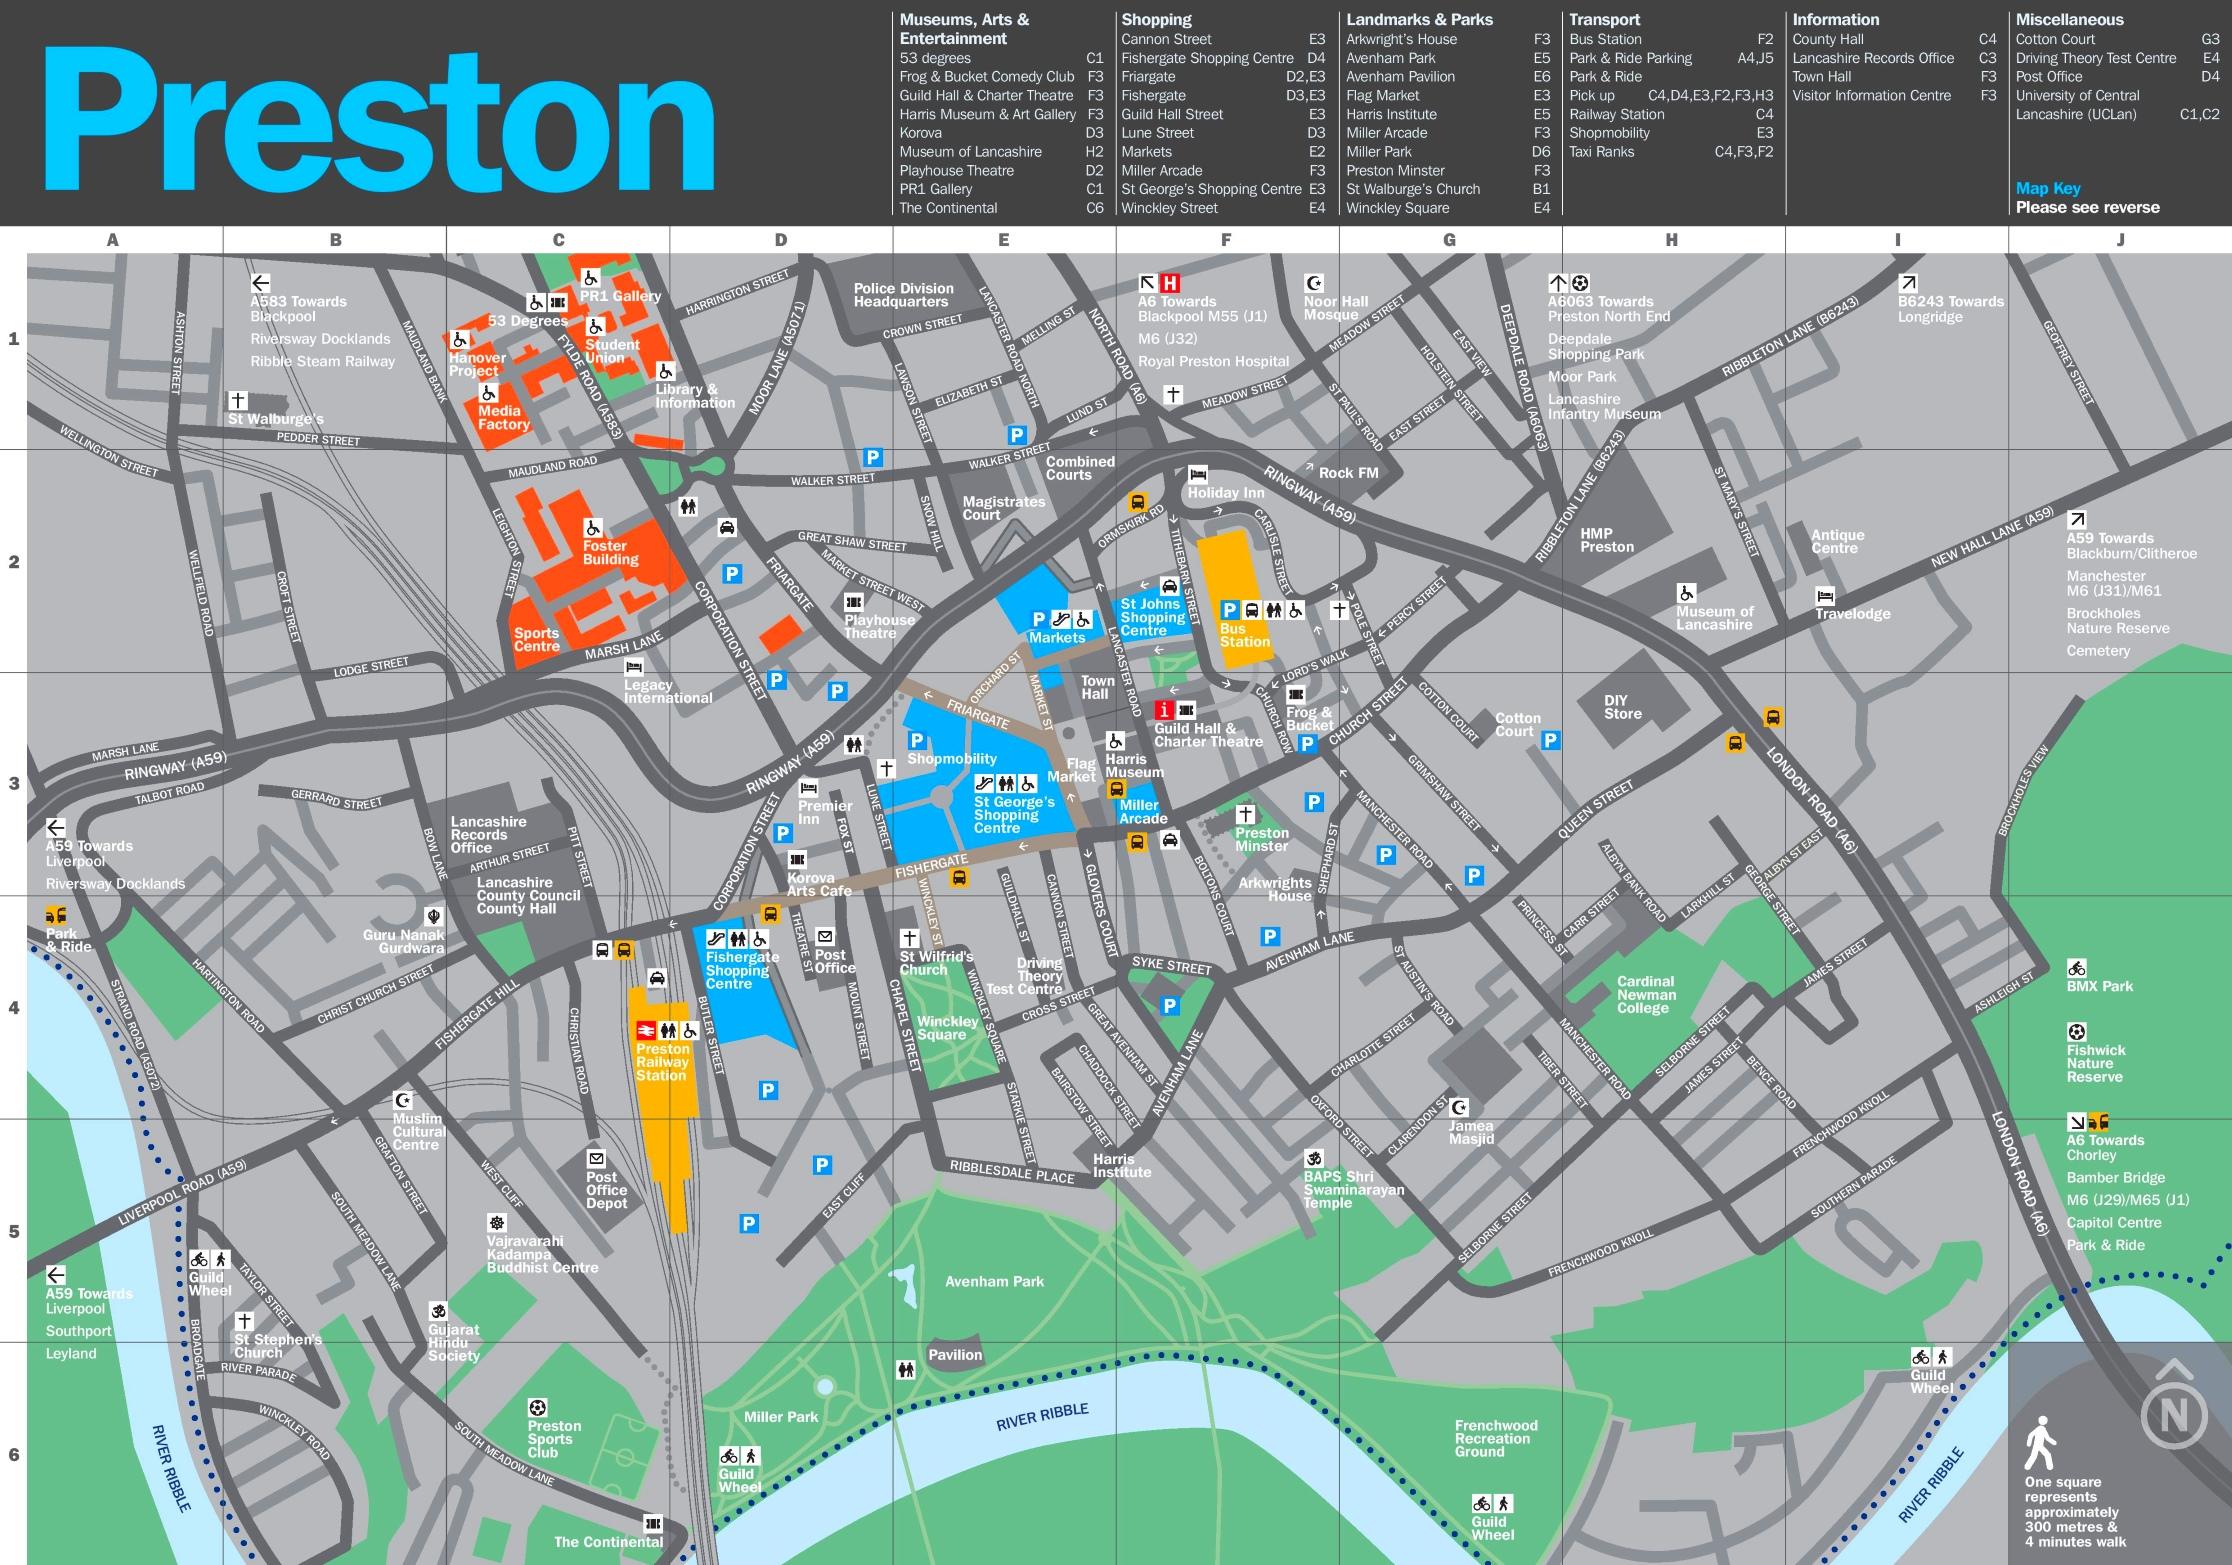 Preston England Map.Preston Maps Uk Maps Of Preston